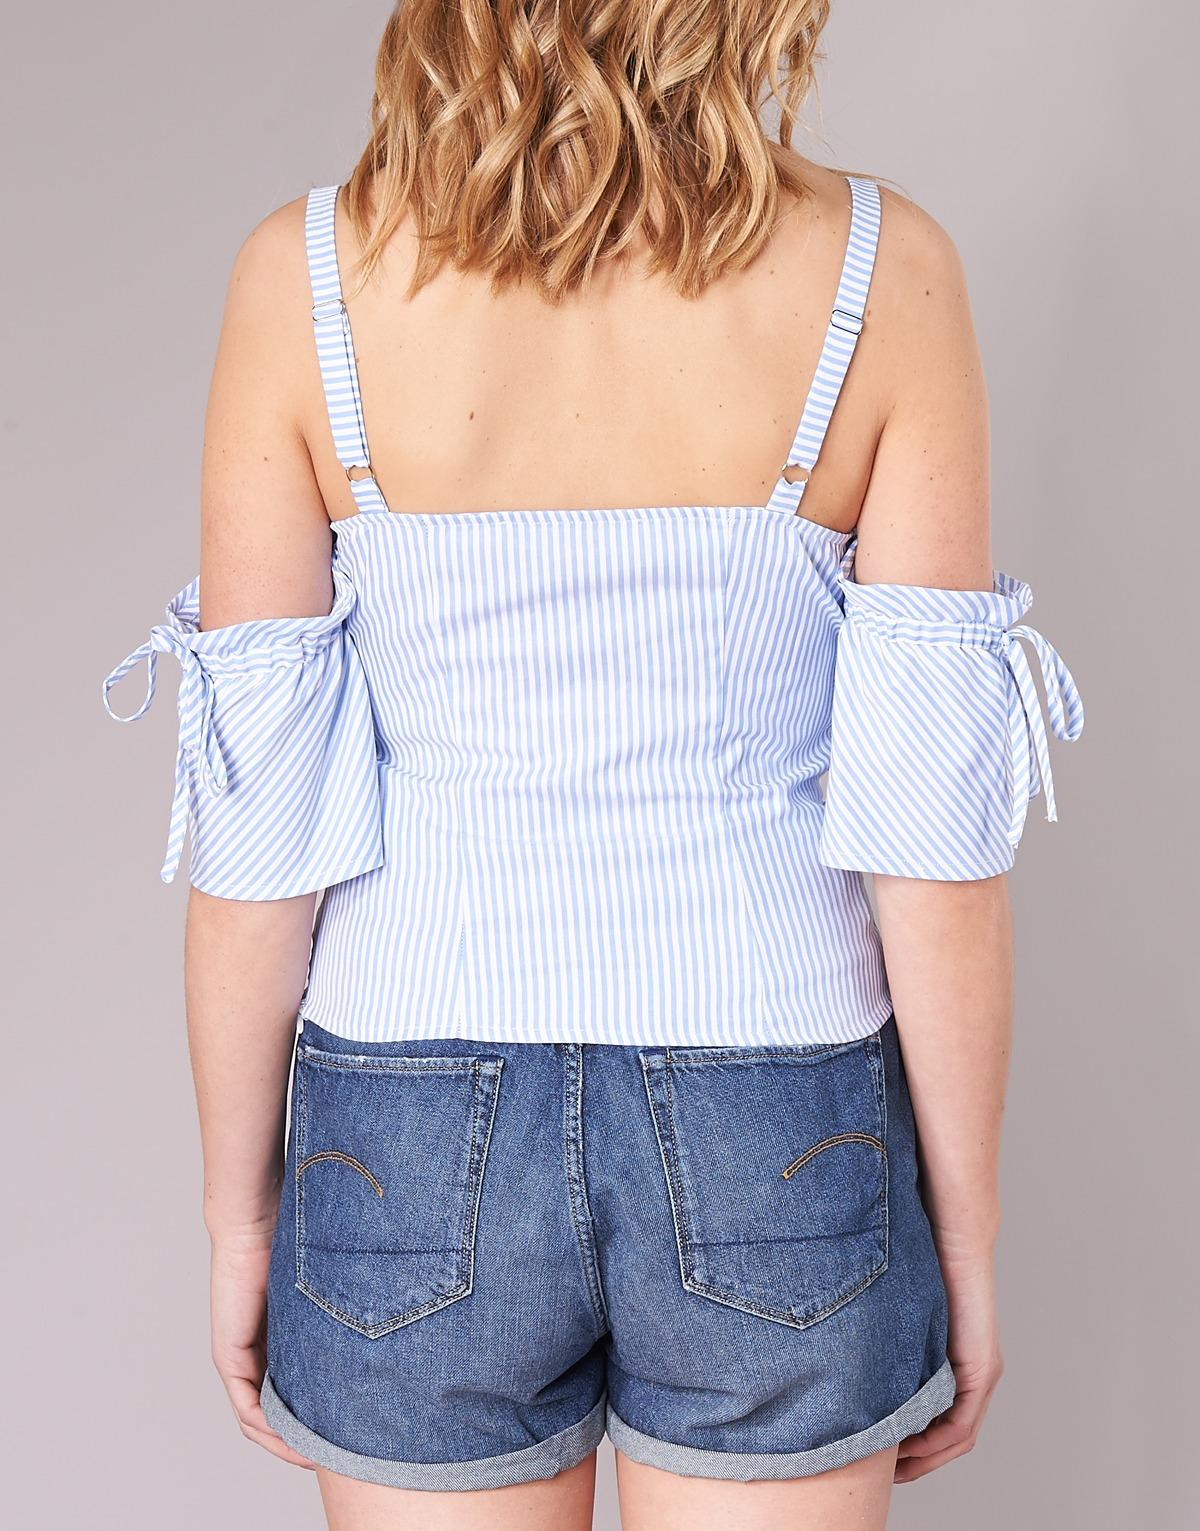 Guess Ounoner Women's Blouse In Blue